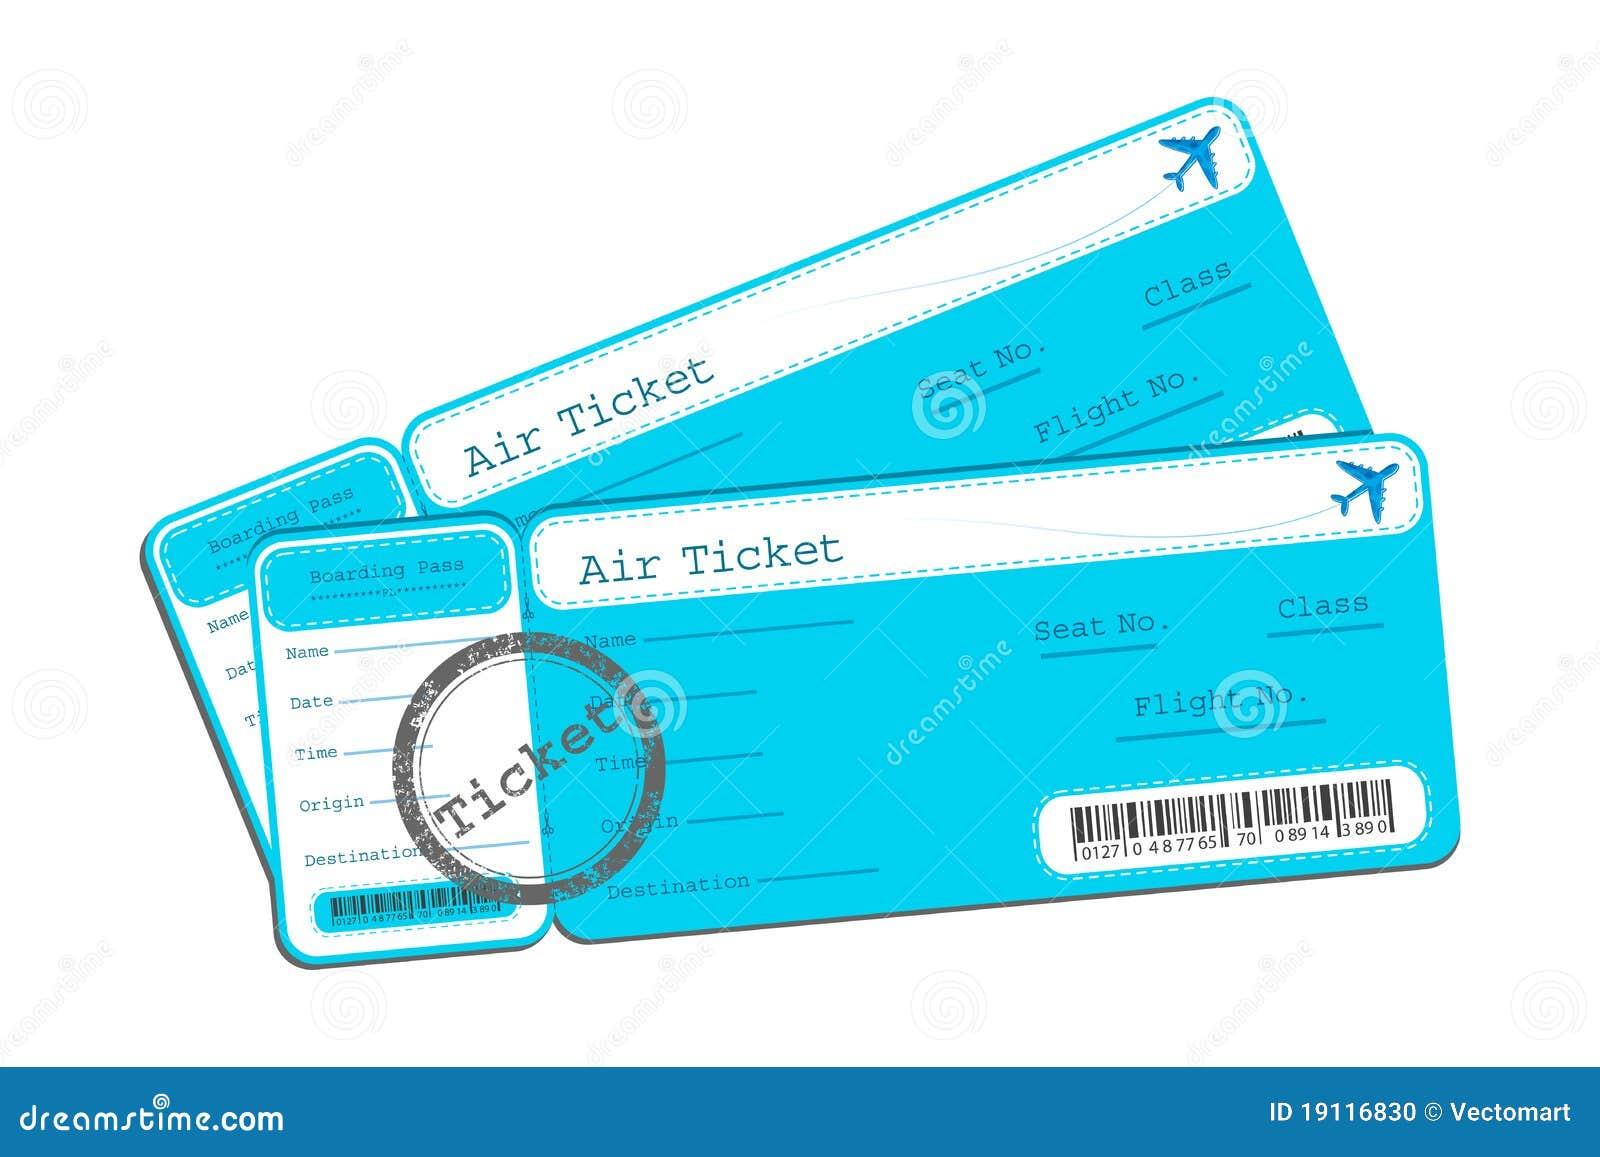 Flight Ticket Stock Photo - Image: 19116830